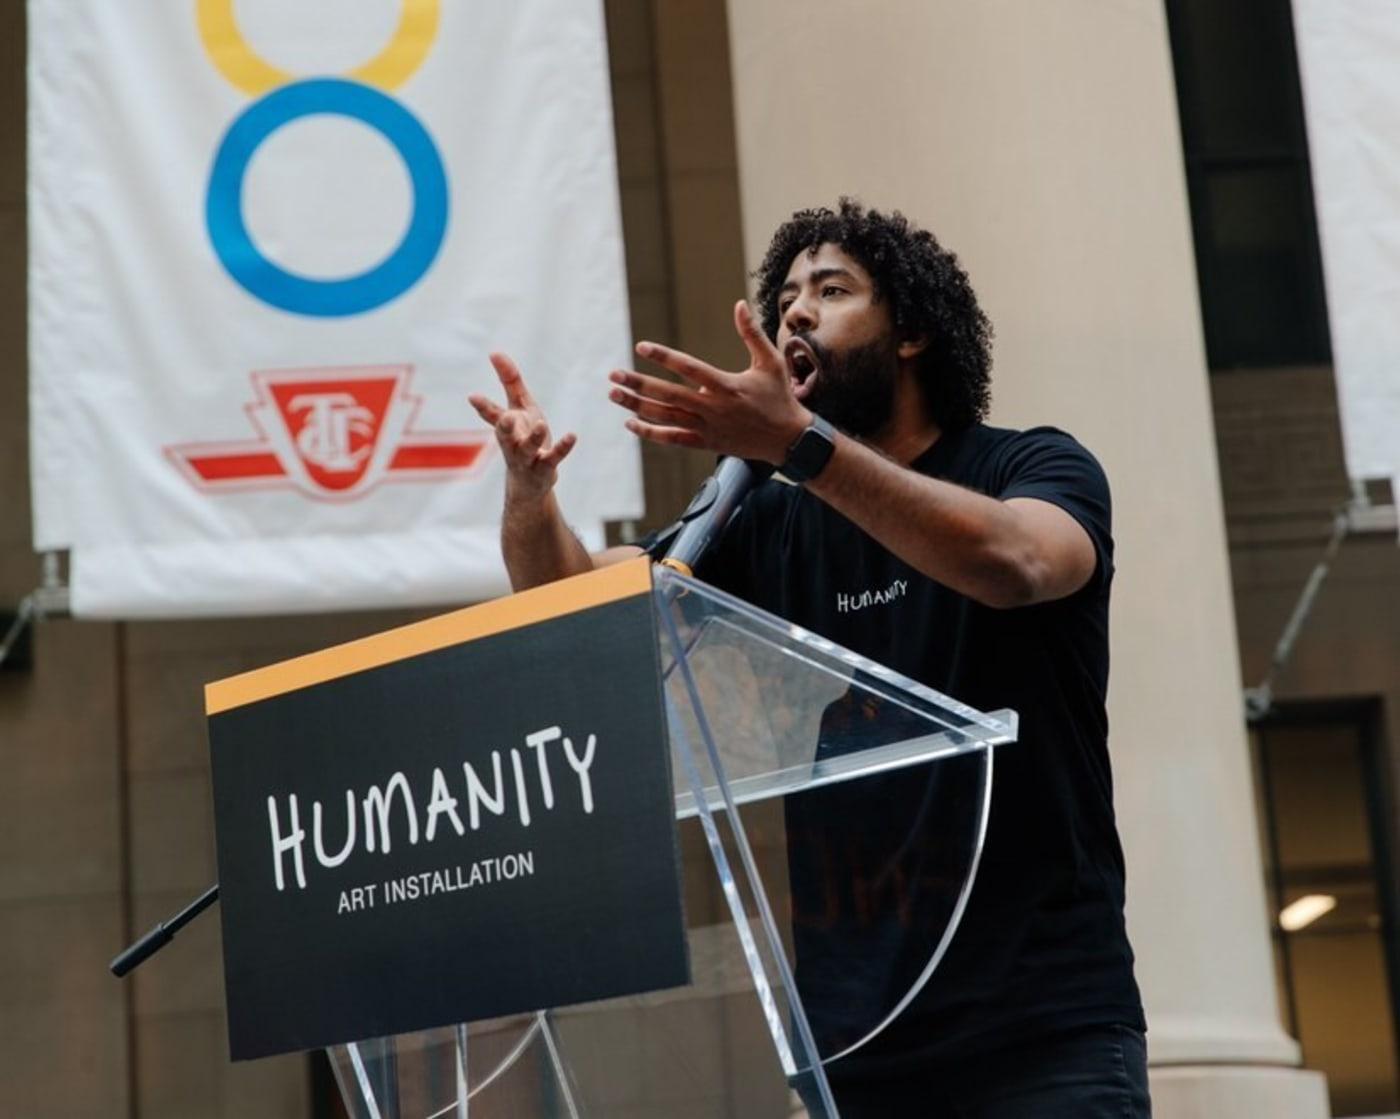 PenMoodz performs spoken word piece at Masai Ujiri's 'Humanity' unveiling